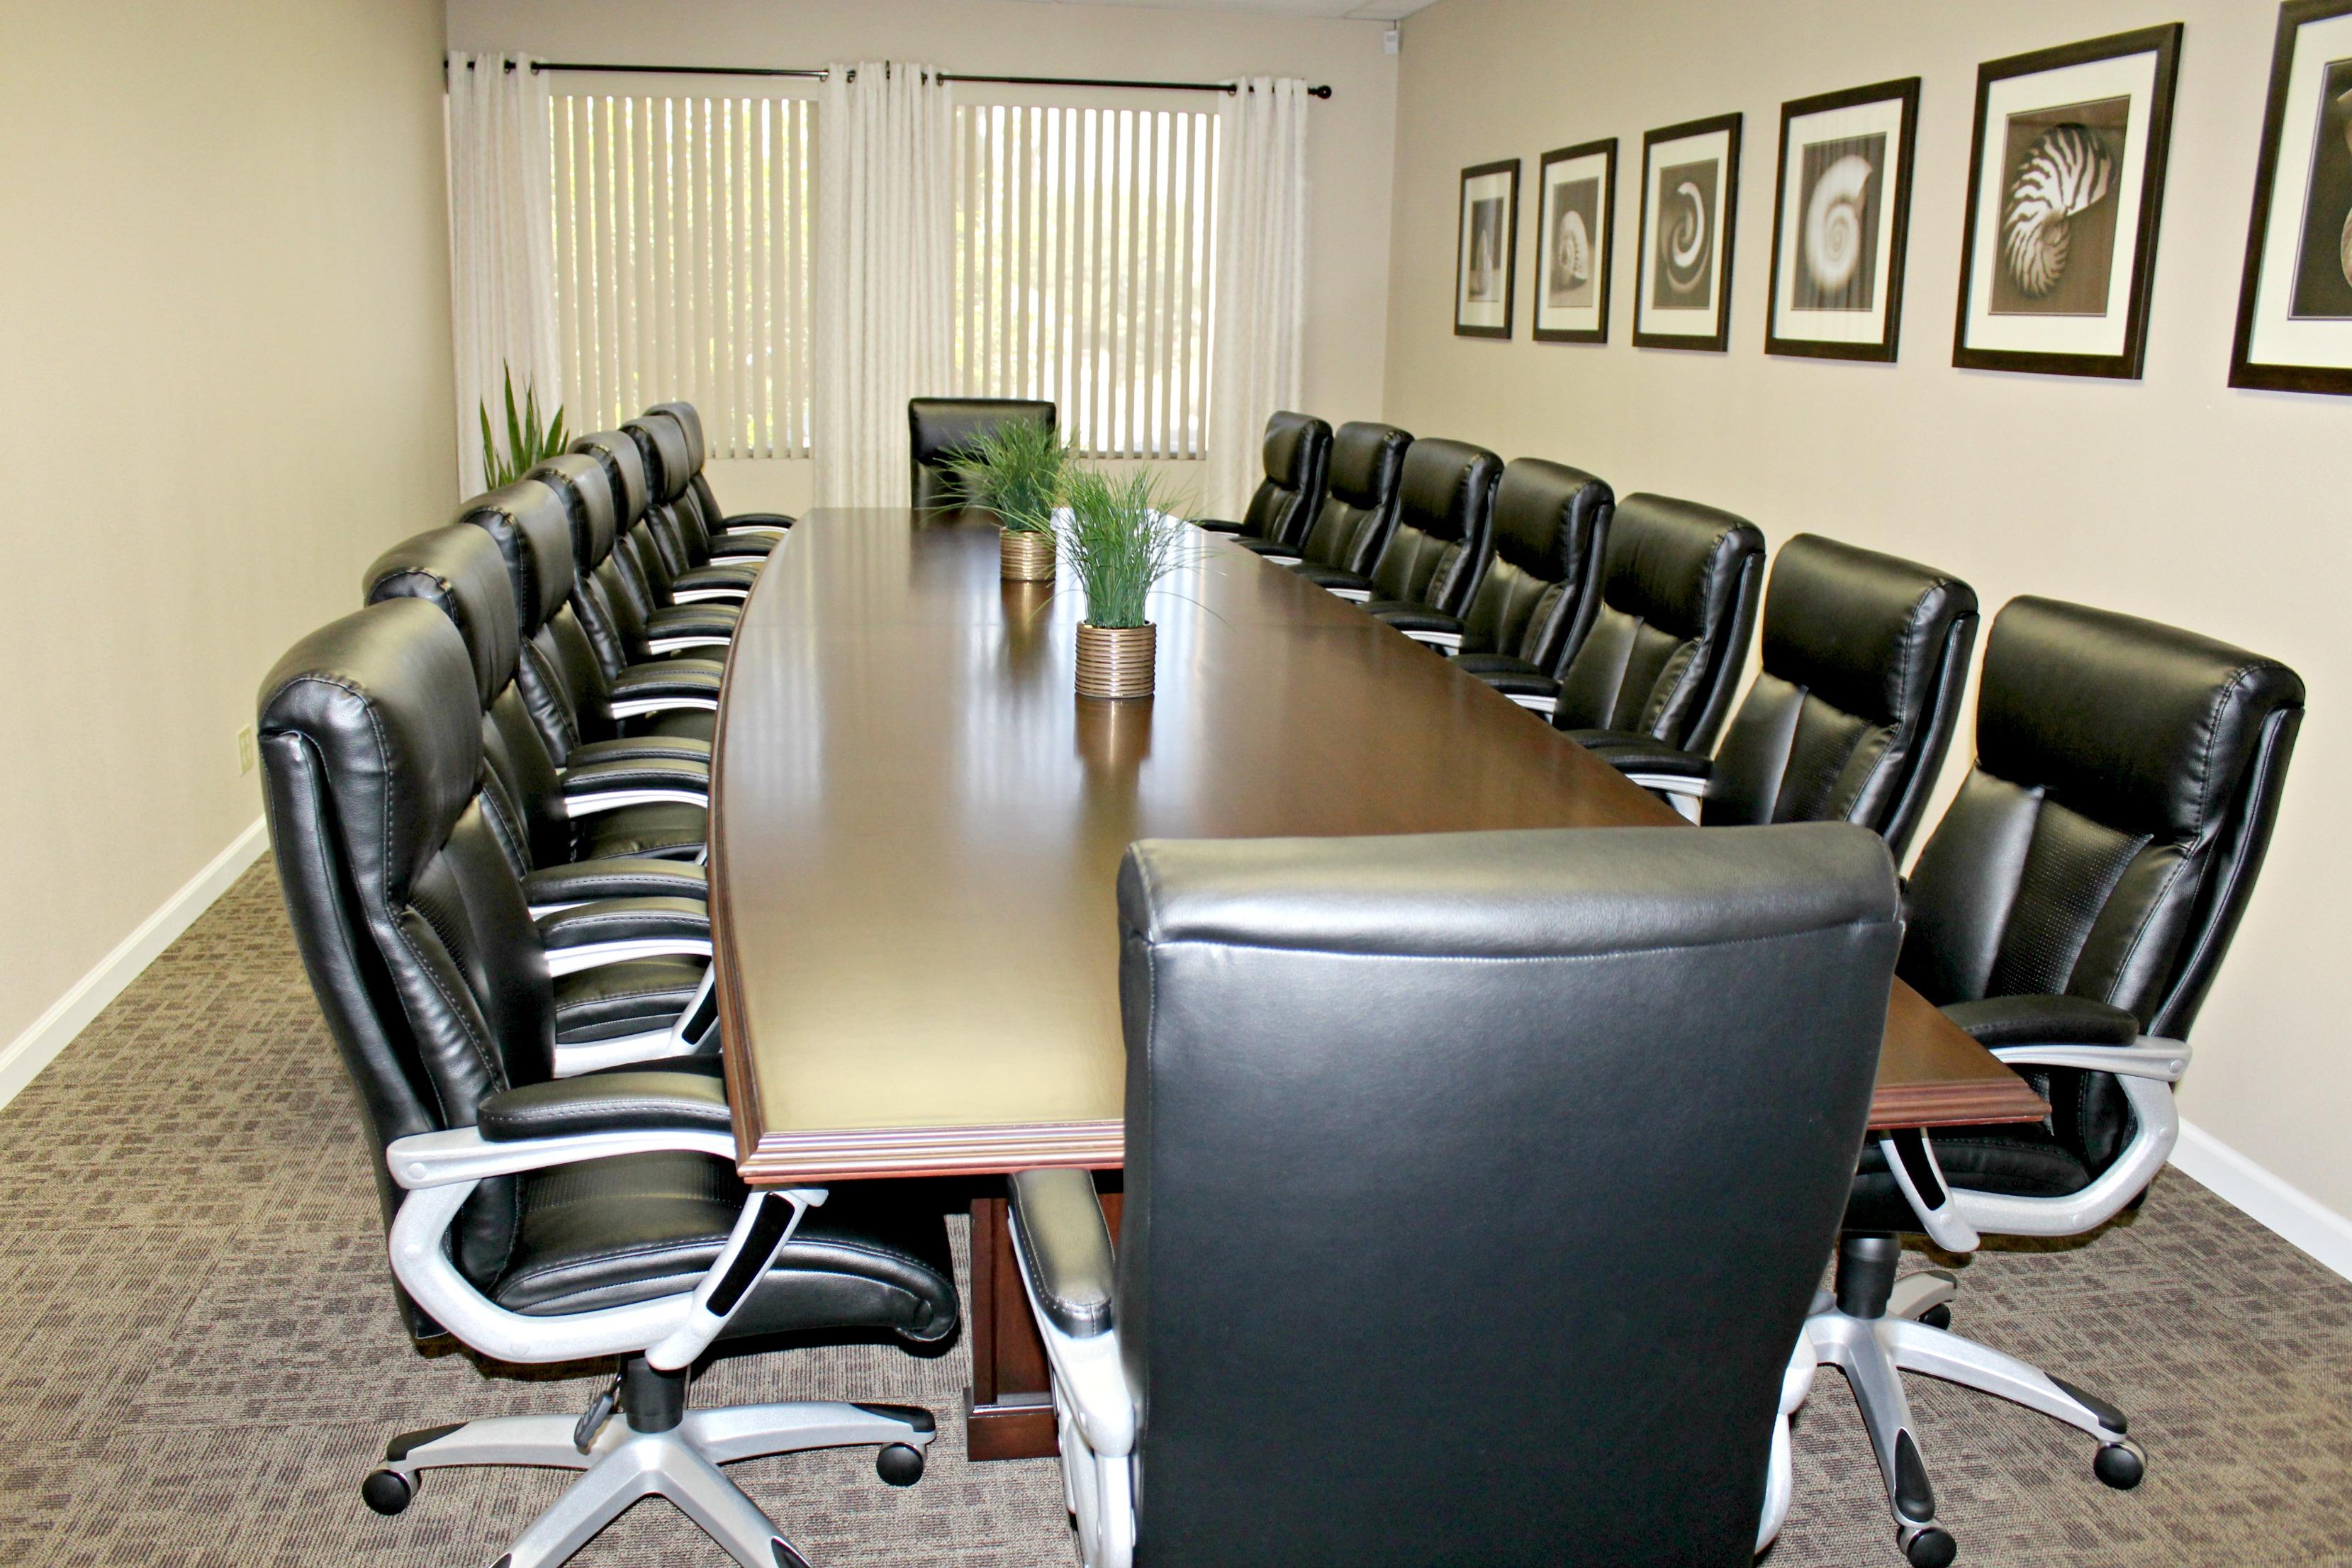 Via Avalon Executive Suite PhotosVia Avalon Executive Suites - 16 person conference table